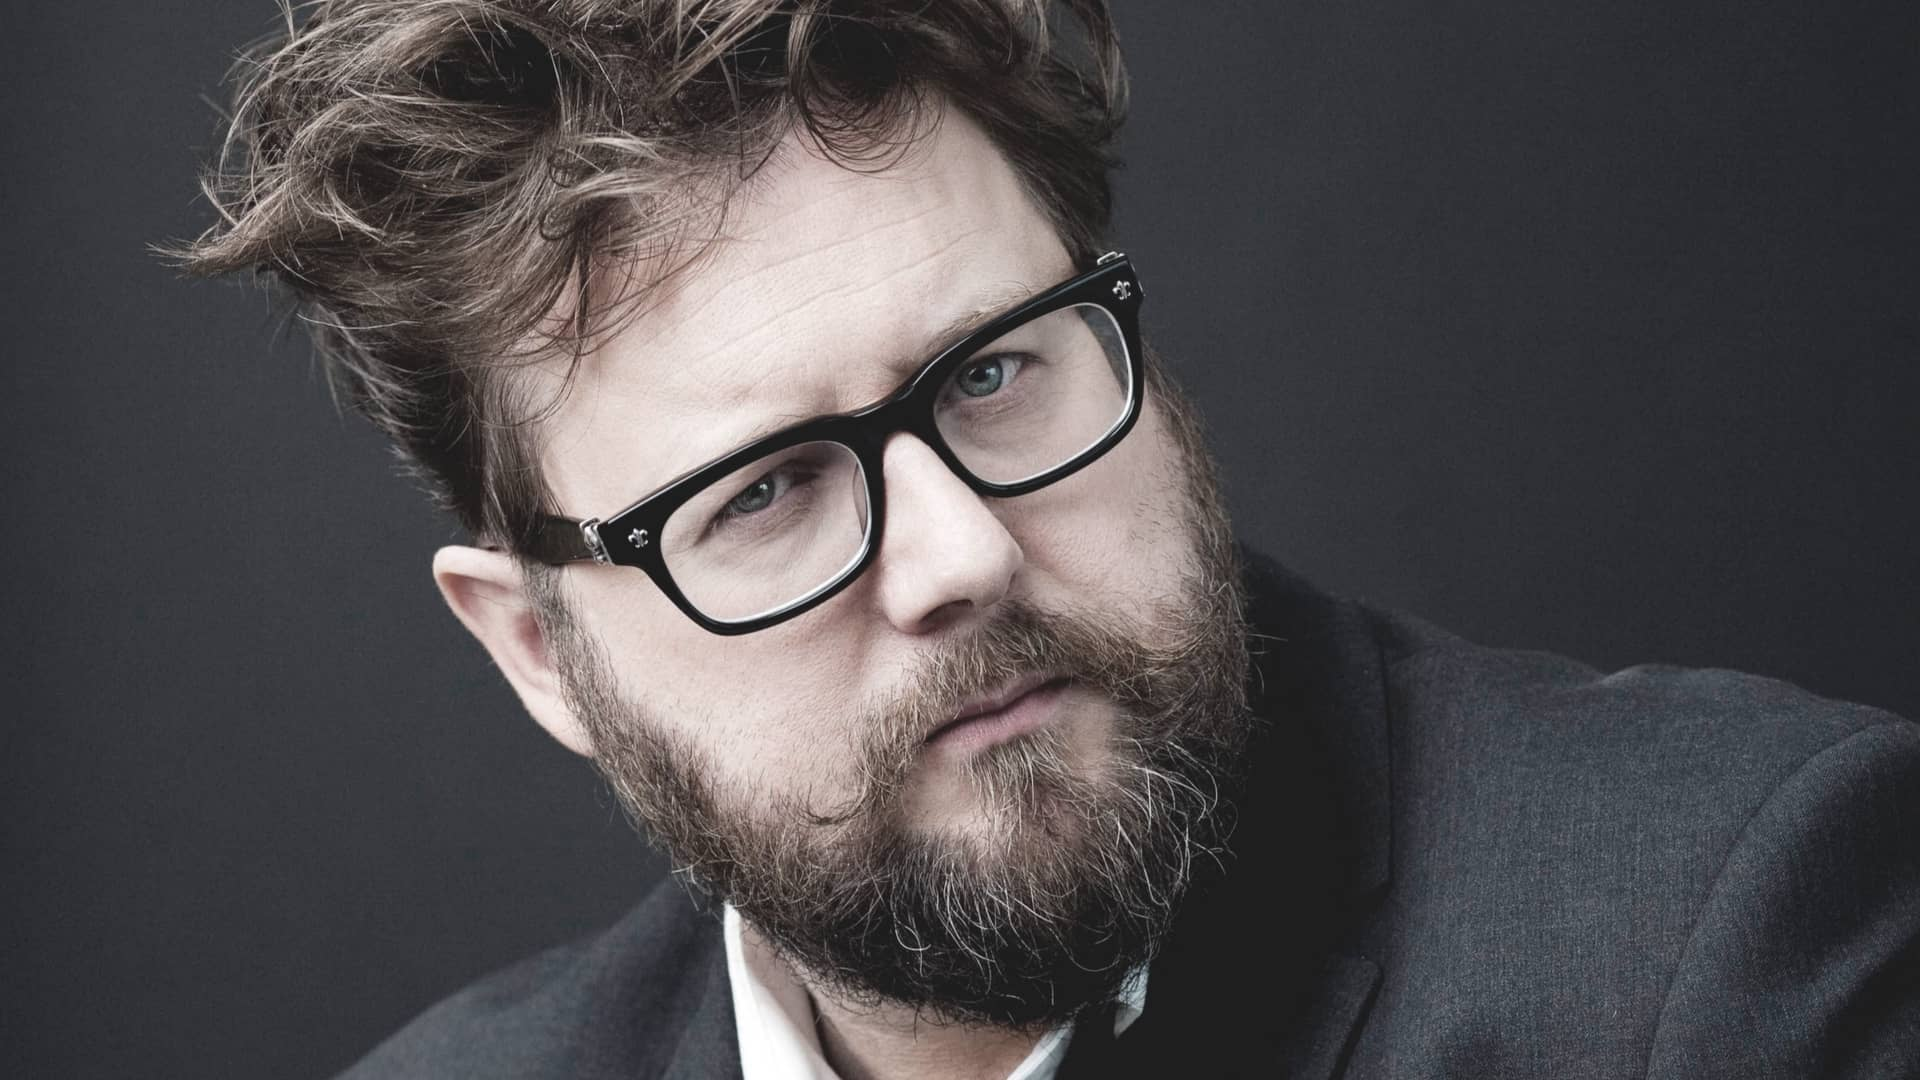 Martin Koolhoven